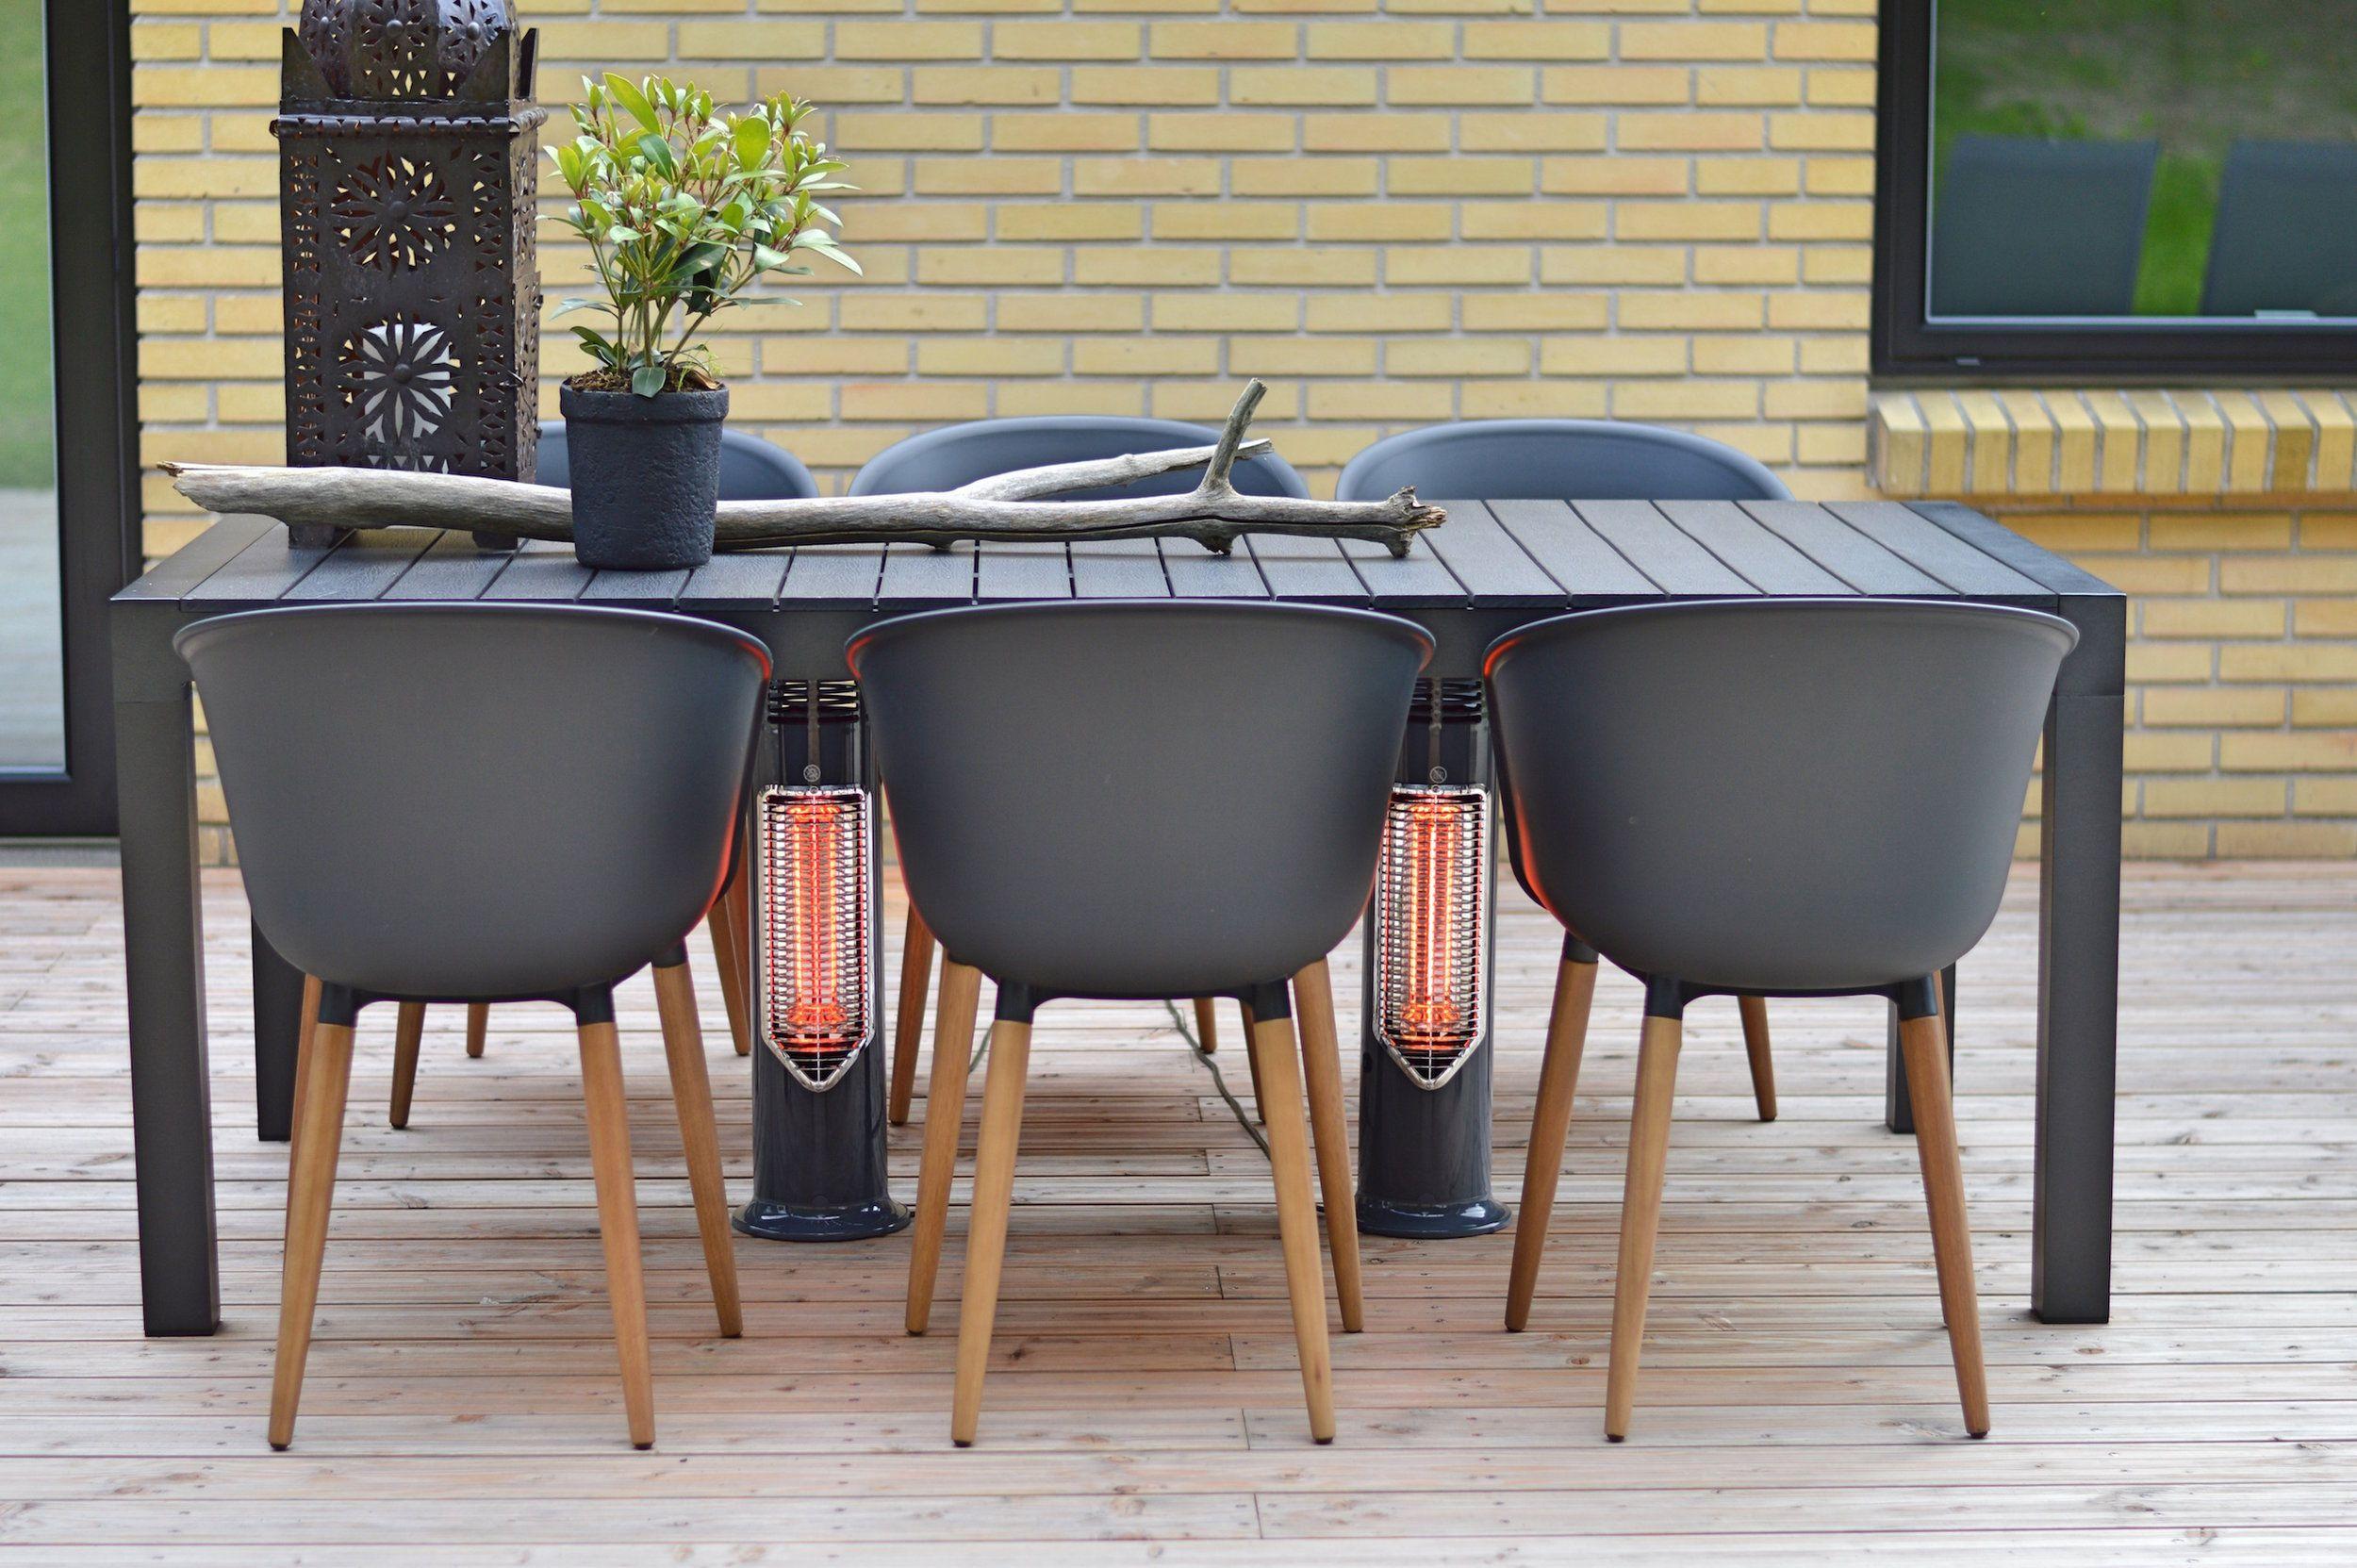 Mensa Heating Imus Under Table Outdoor Heater